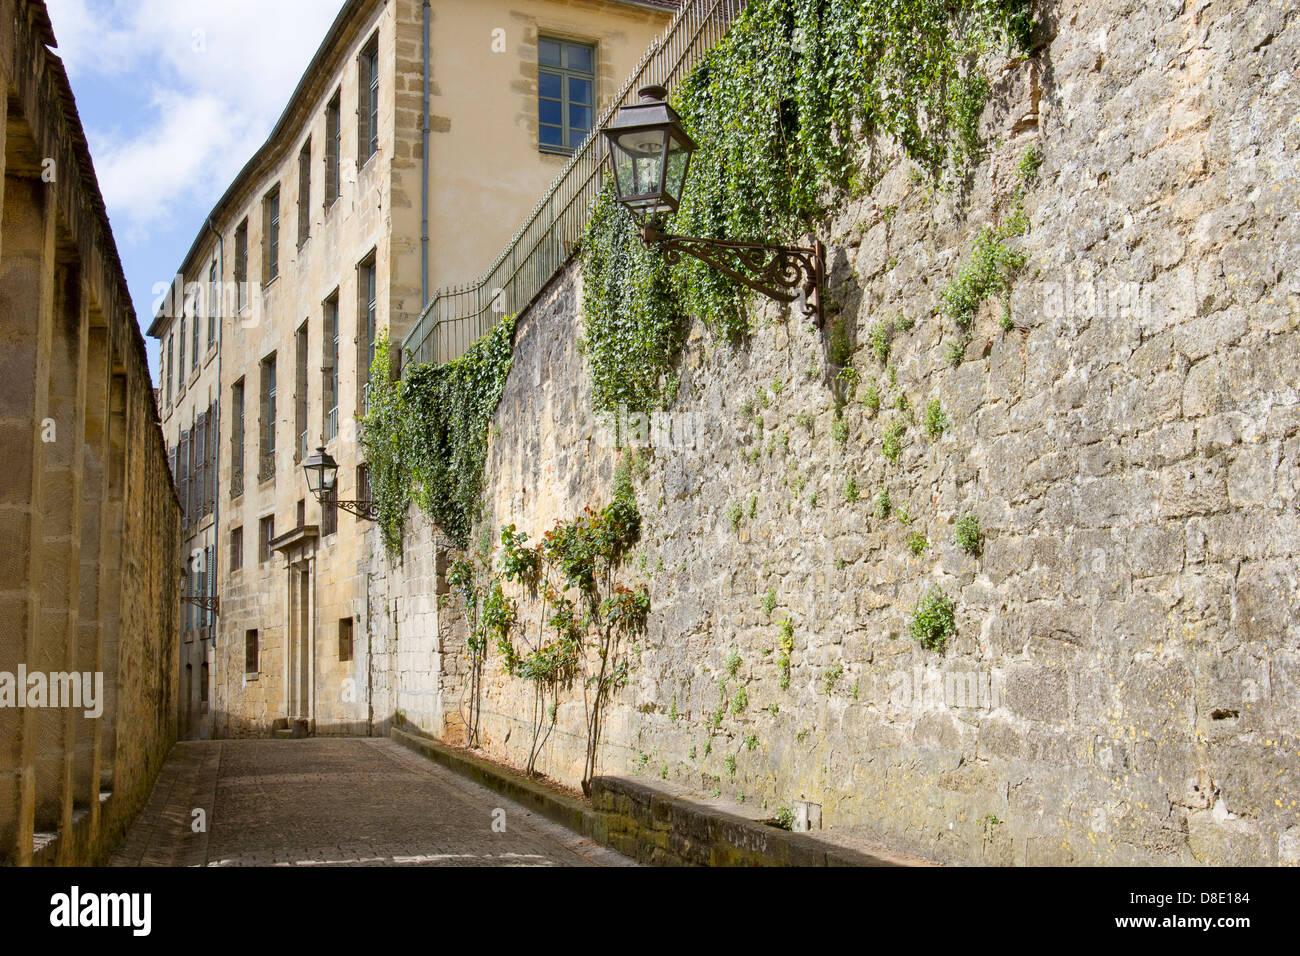 Ivy growing on medieval sandstone buildings along cobblestone street in charming Sarlat, Dordogne region of France - Stock Image